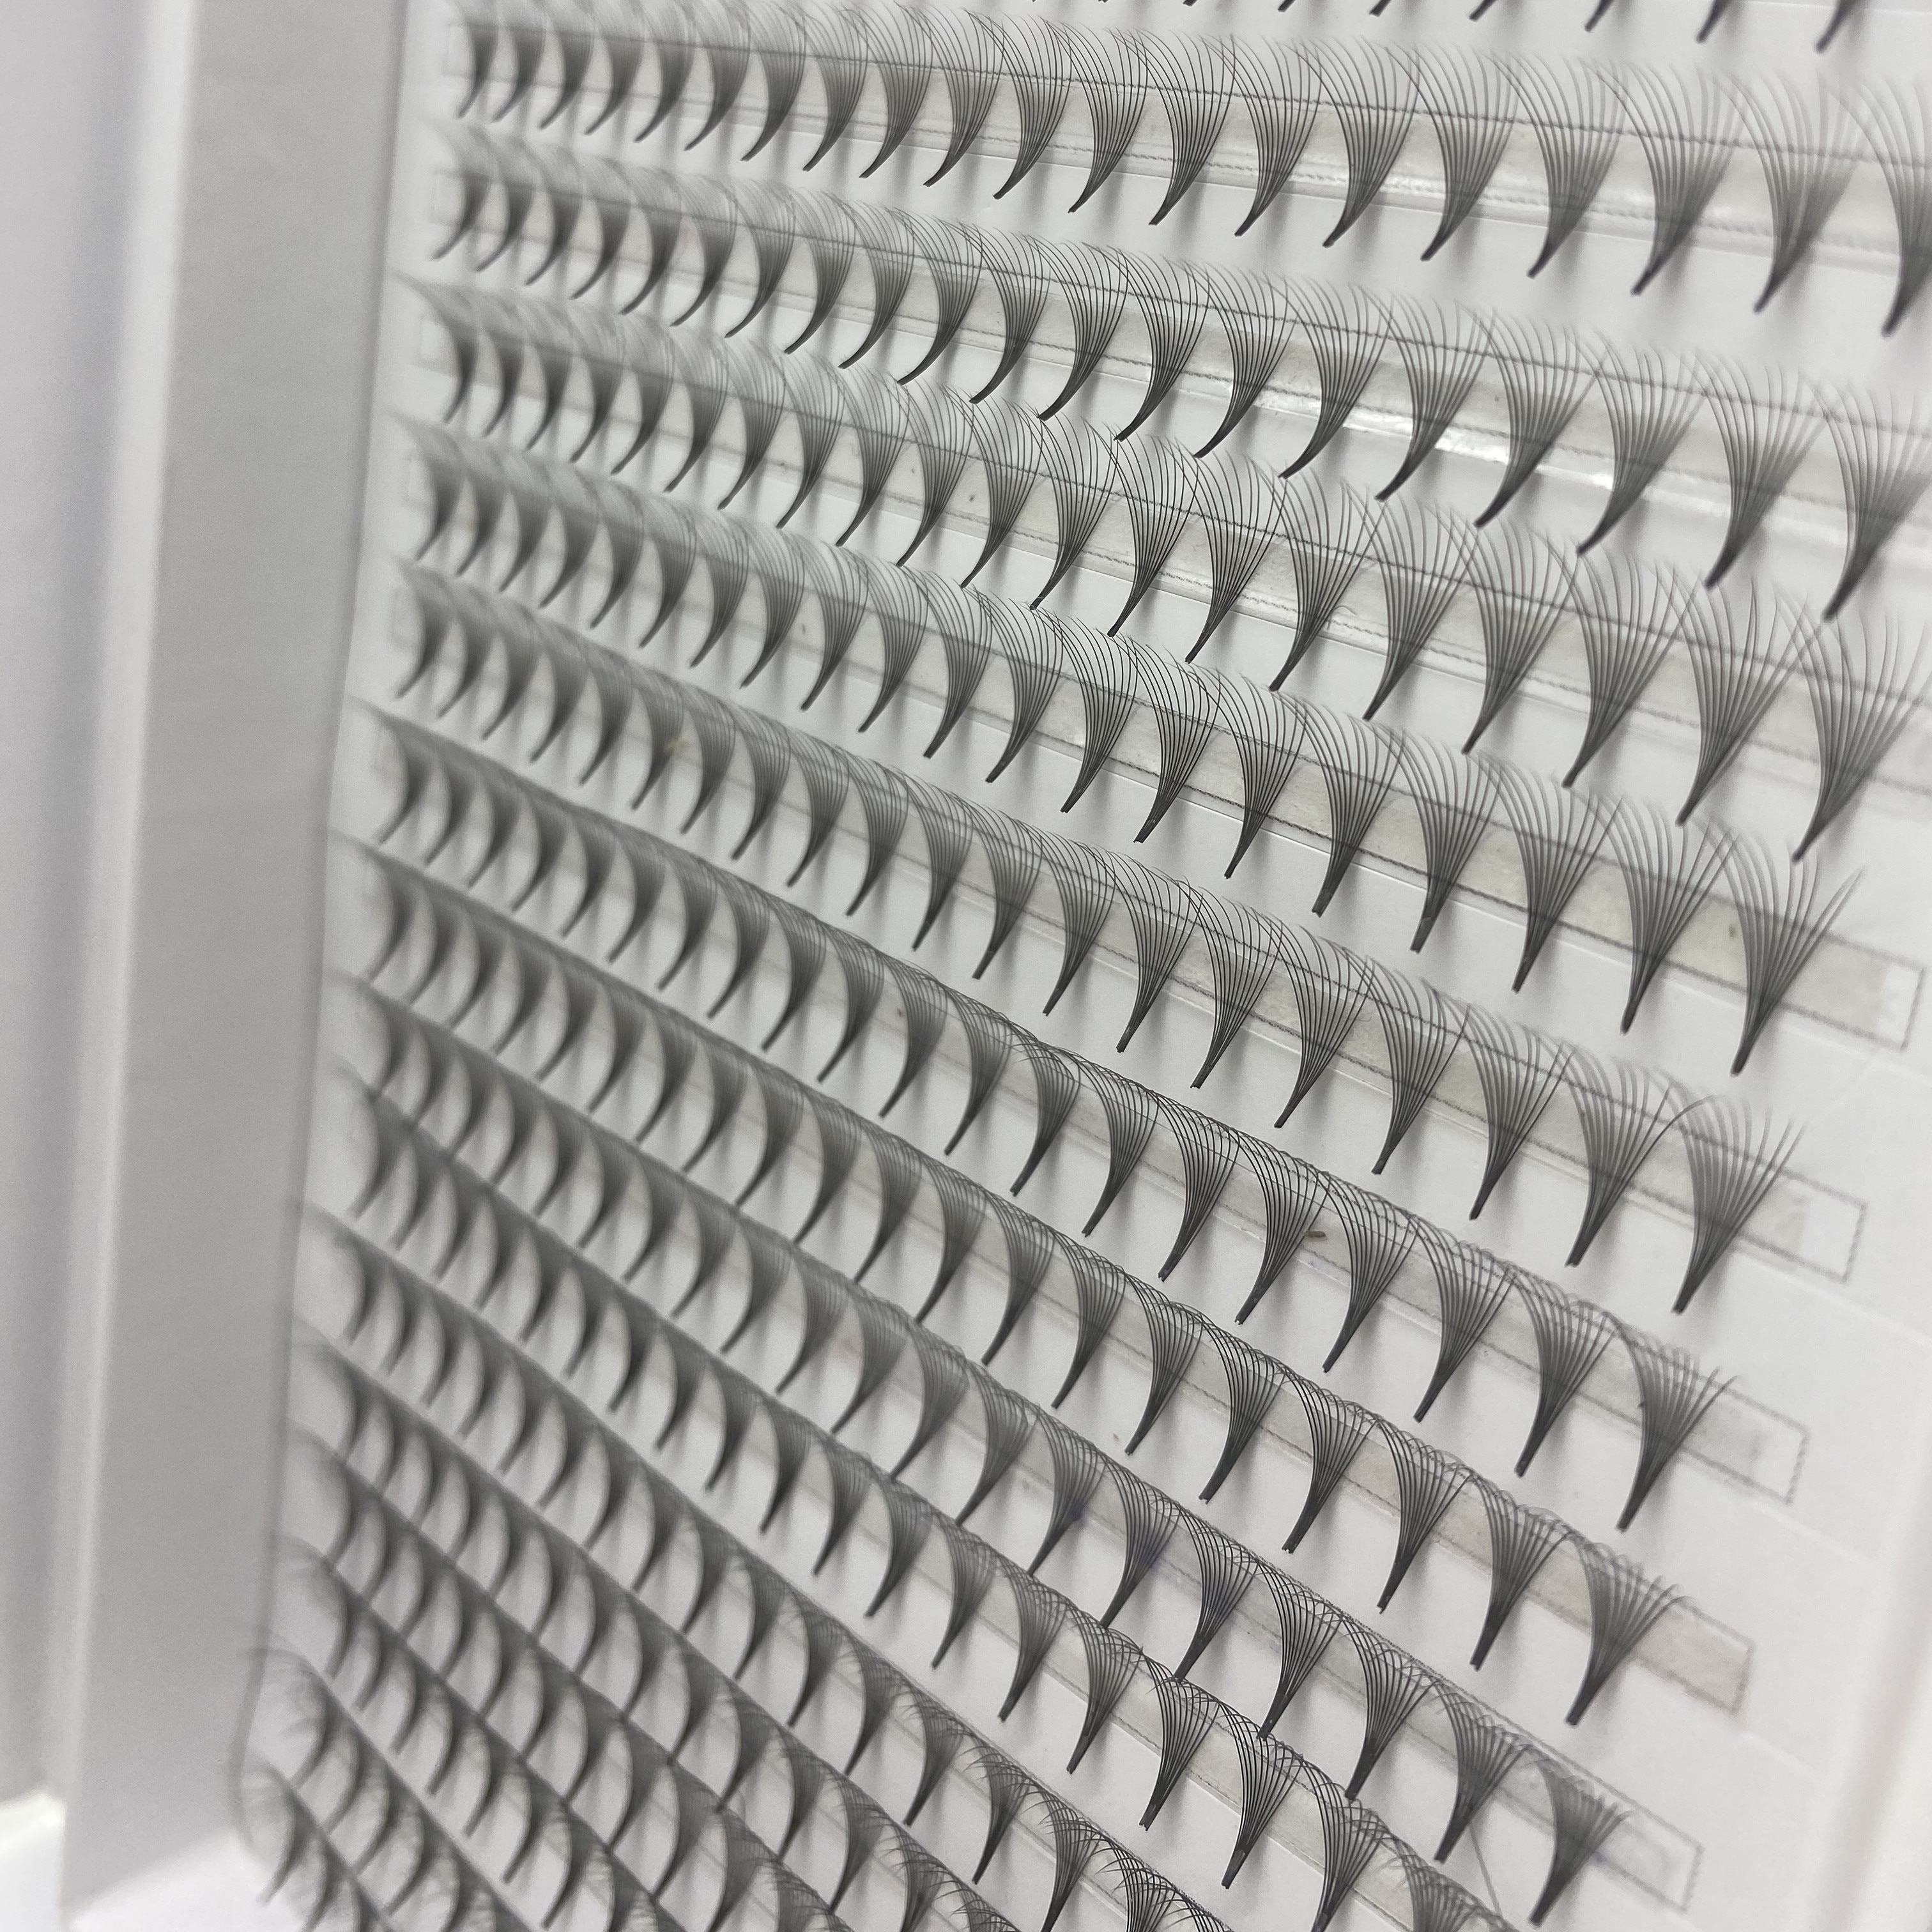 400 fans 20 lines mix length Premade Russian Volume Fans 10D Premade Eyelash Extensions Supplies  customizable label